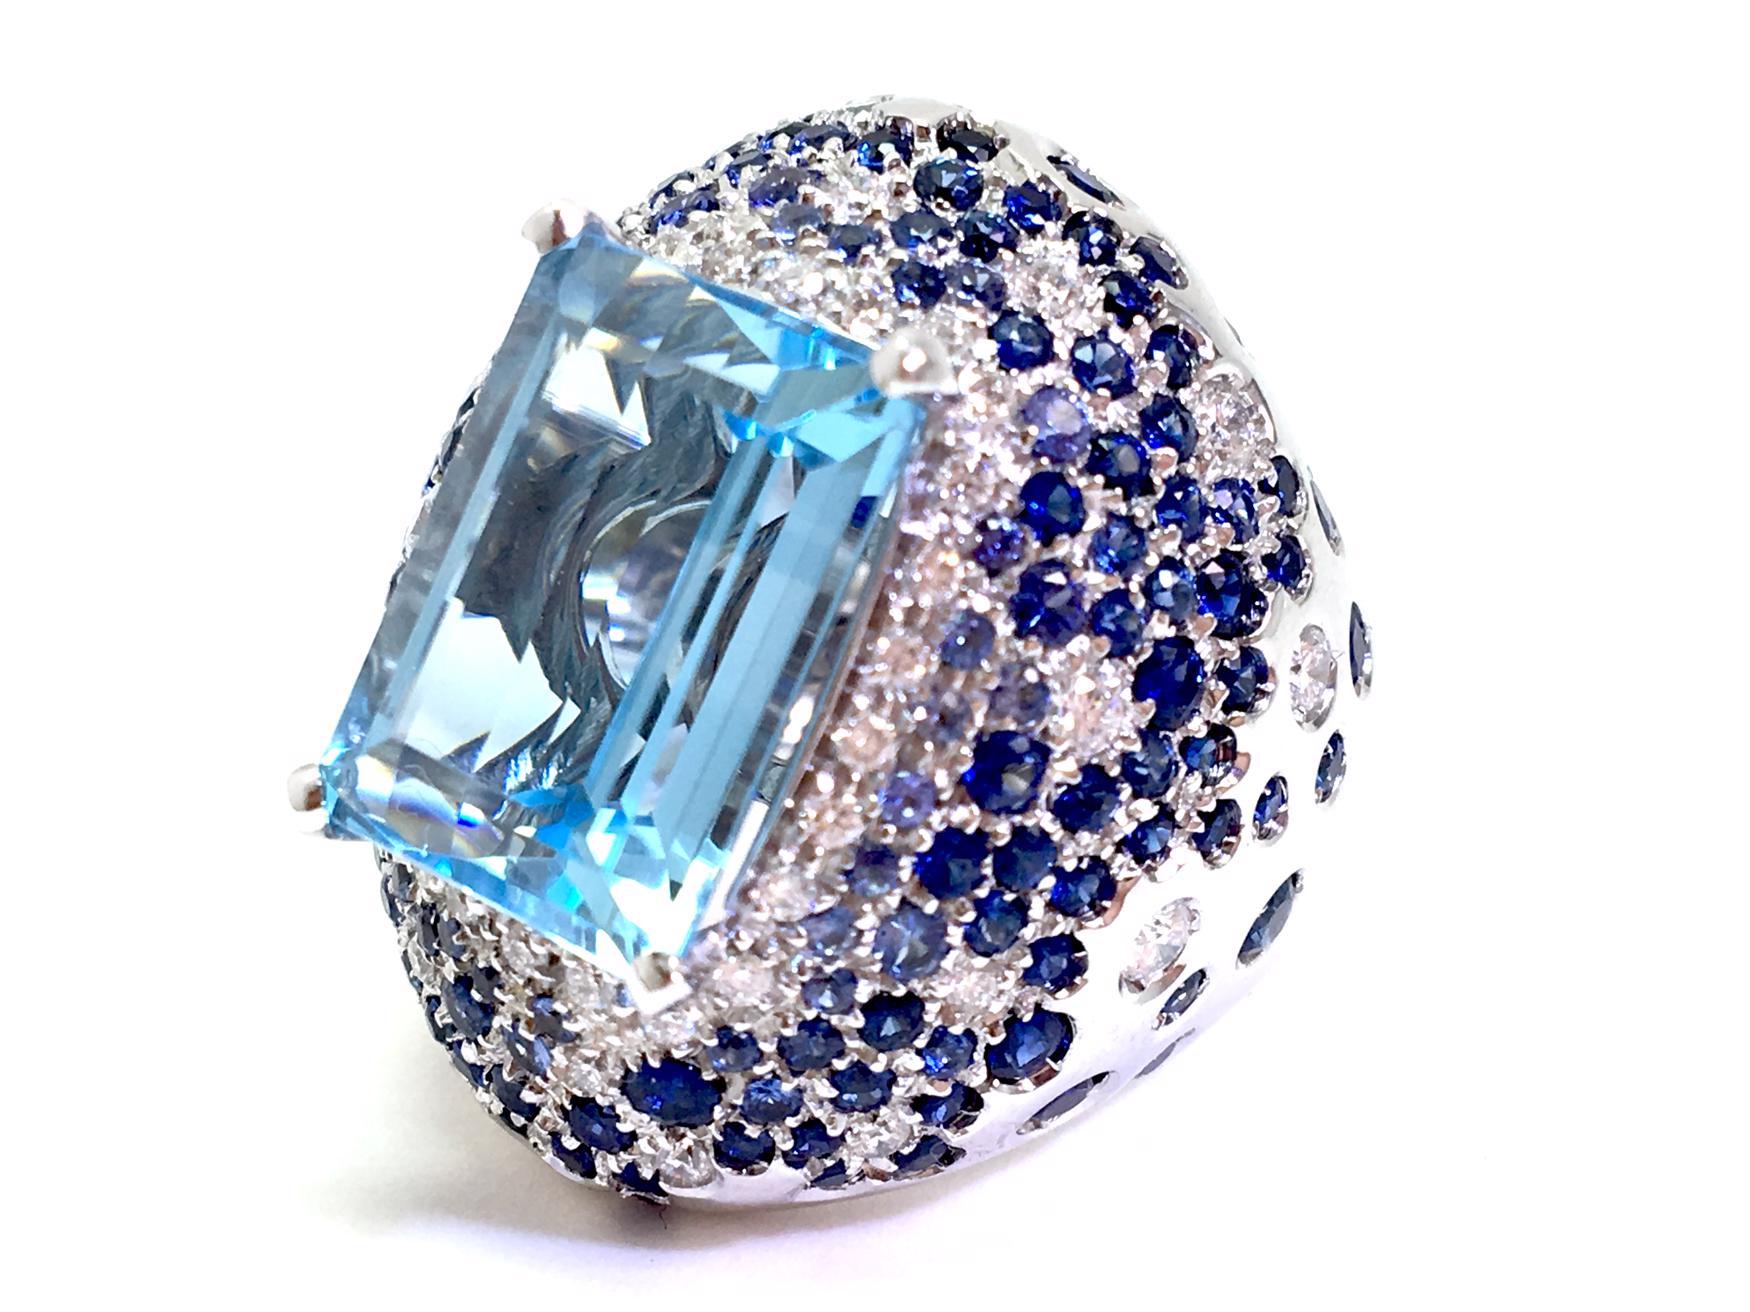 Sensi joyas alta joyería Granada plata compromiso ANILLO ORO BLANCO  18K BRILLANTES  1,60 CTS